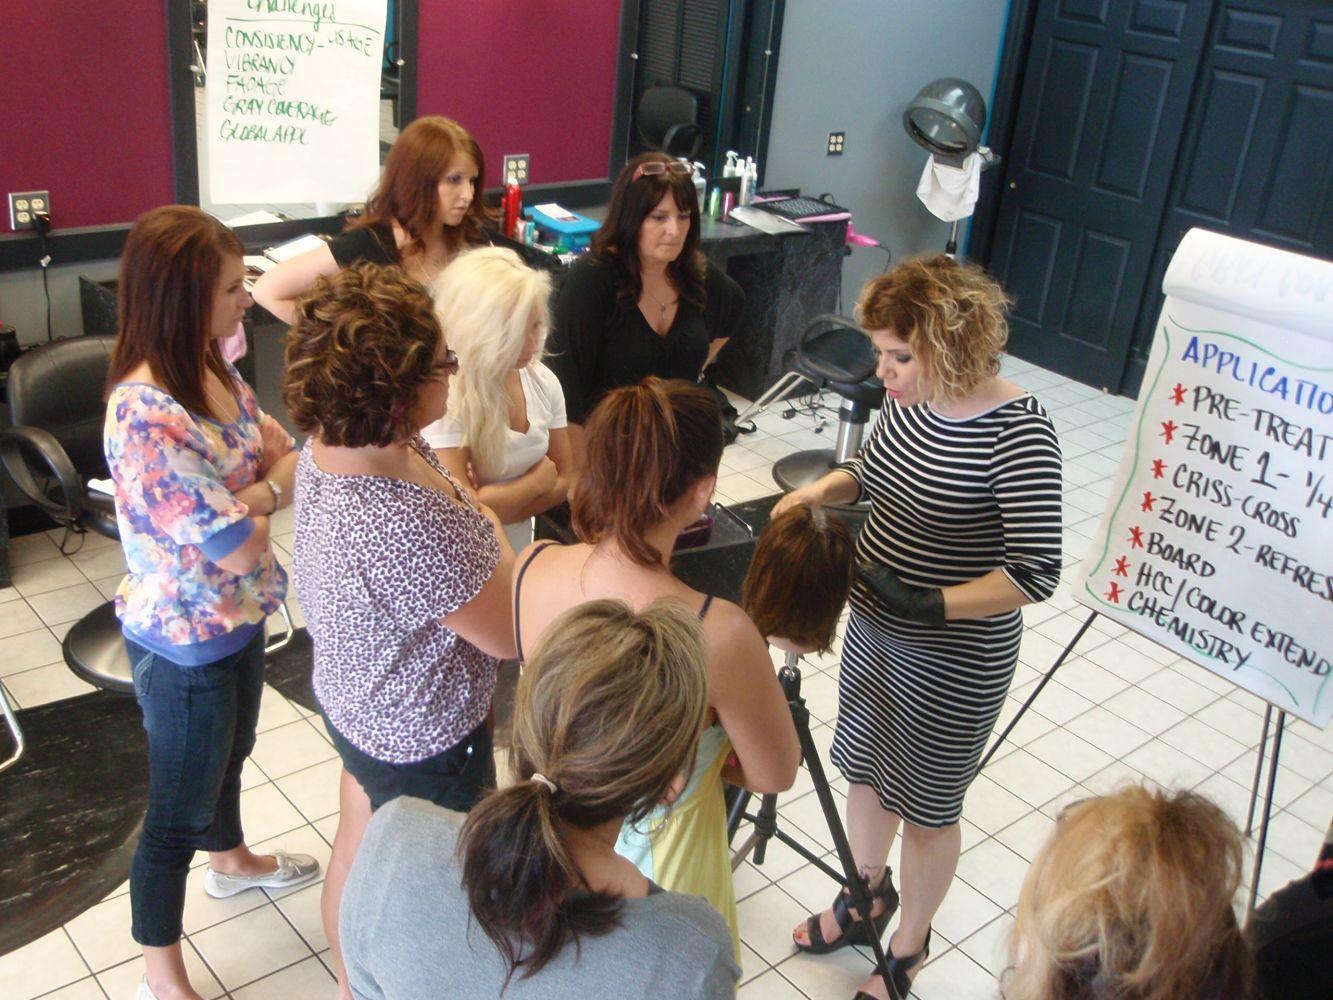 A stylist educates other stylists